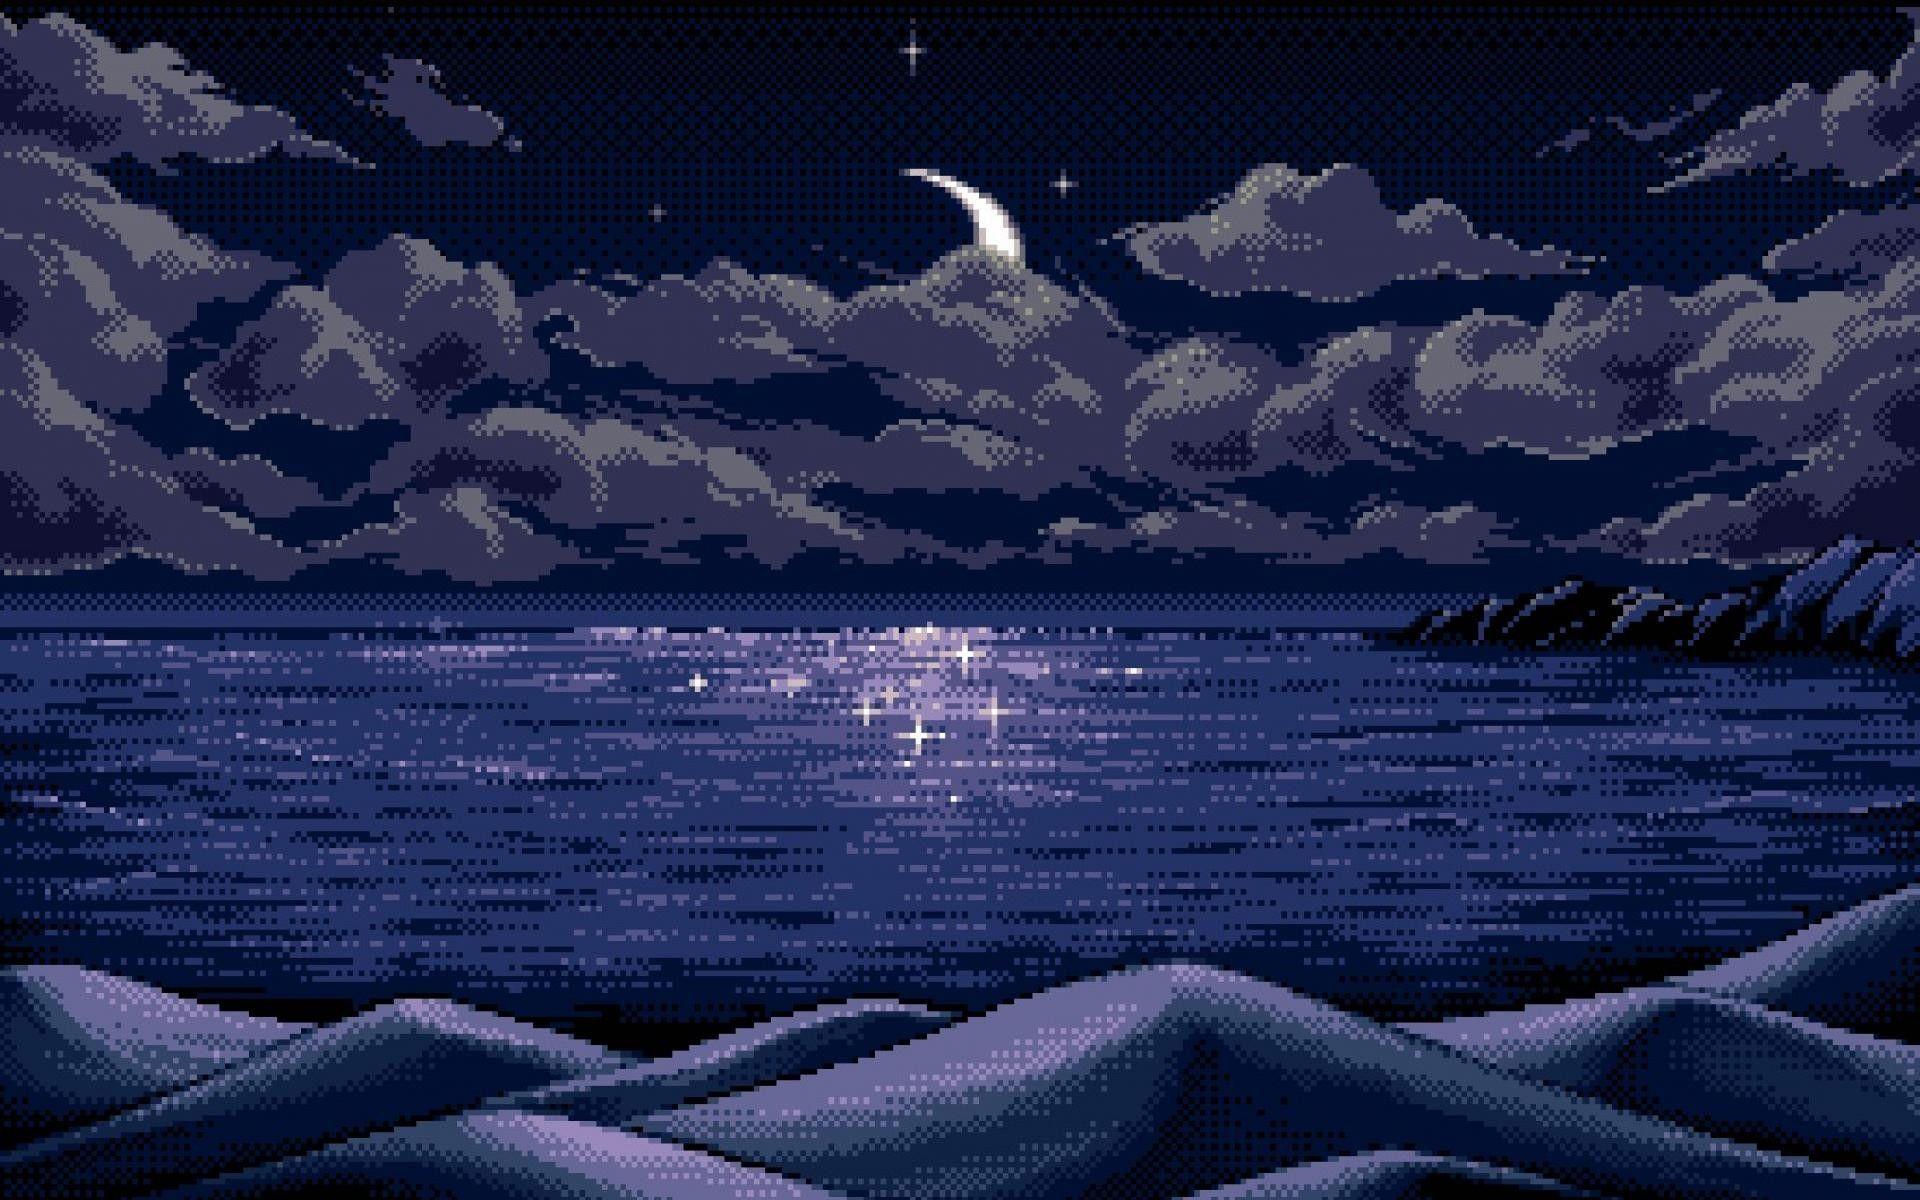 Landscape Tumblr Wallpapers Hd Pixel Art Landscape Desktop Wallpaper Art Pixel Art